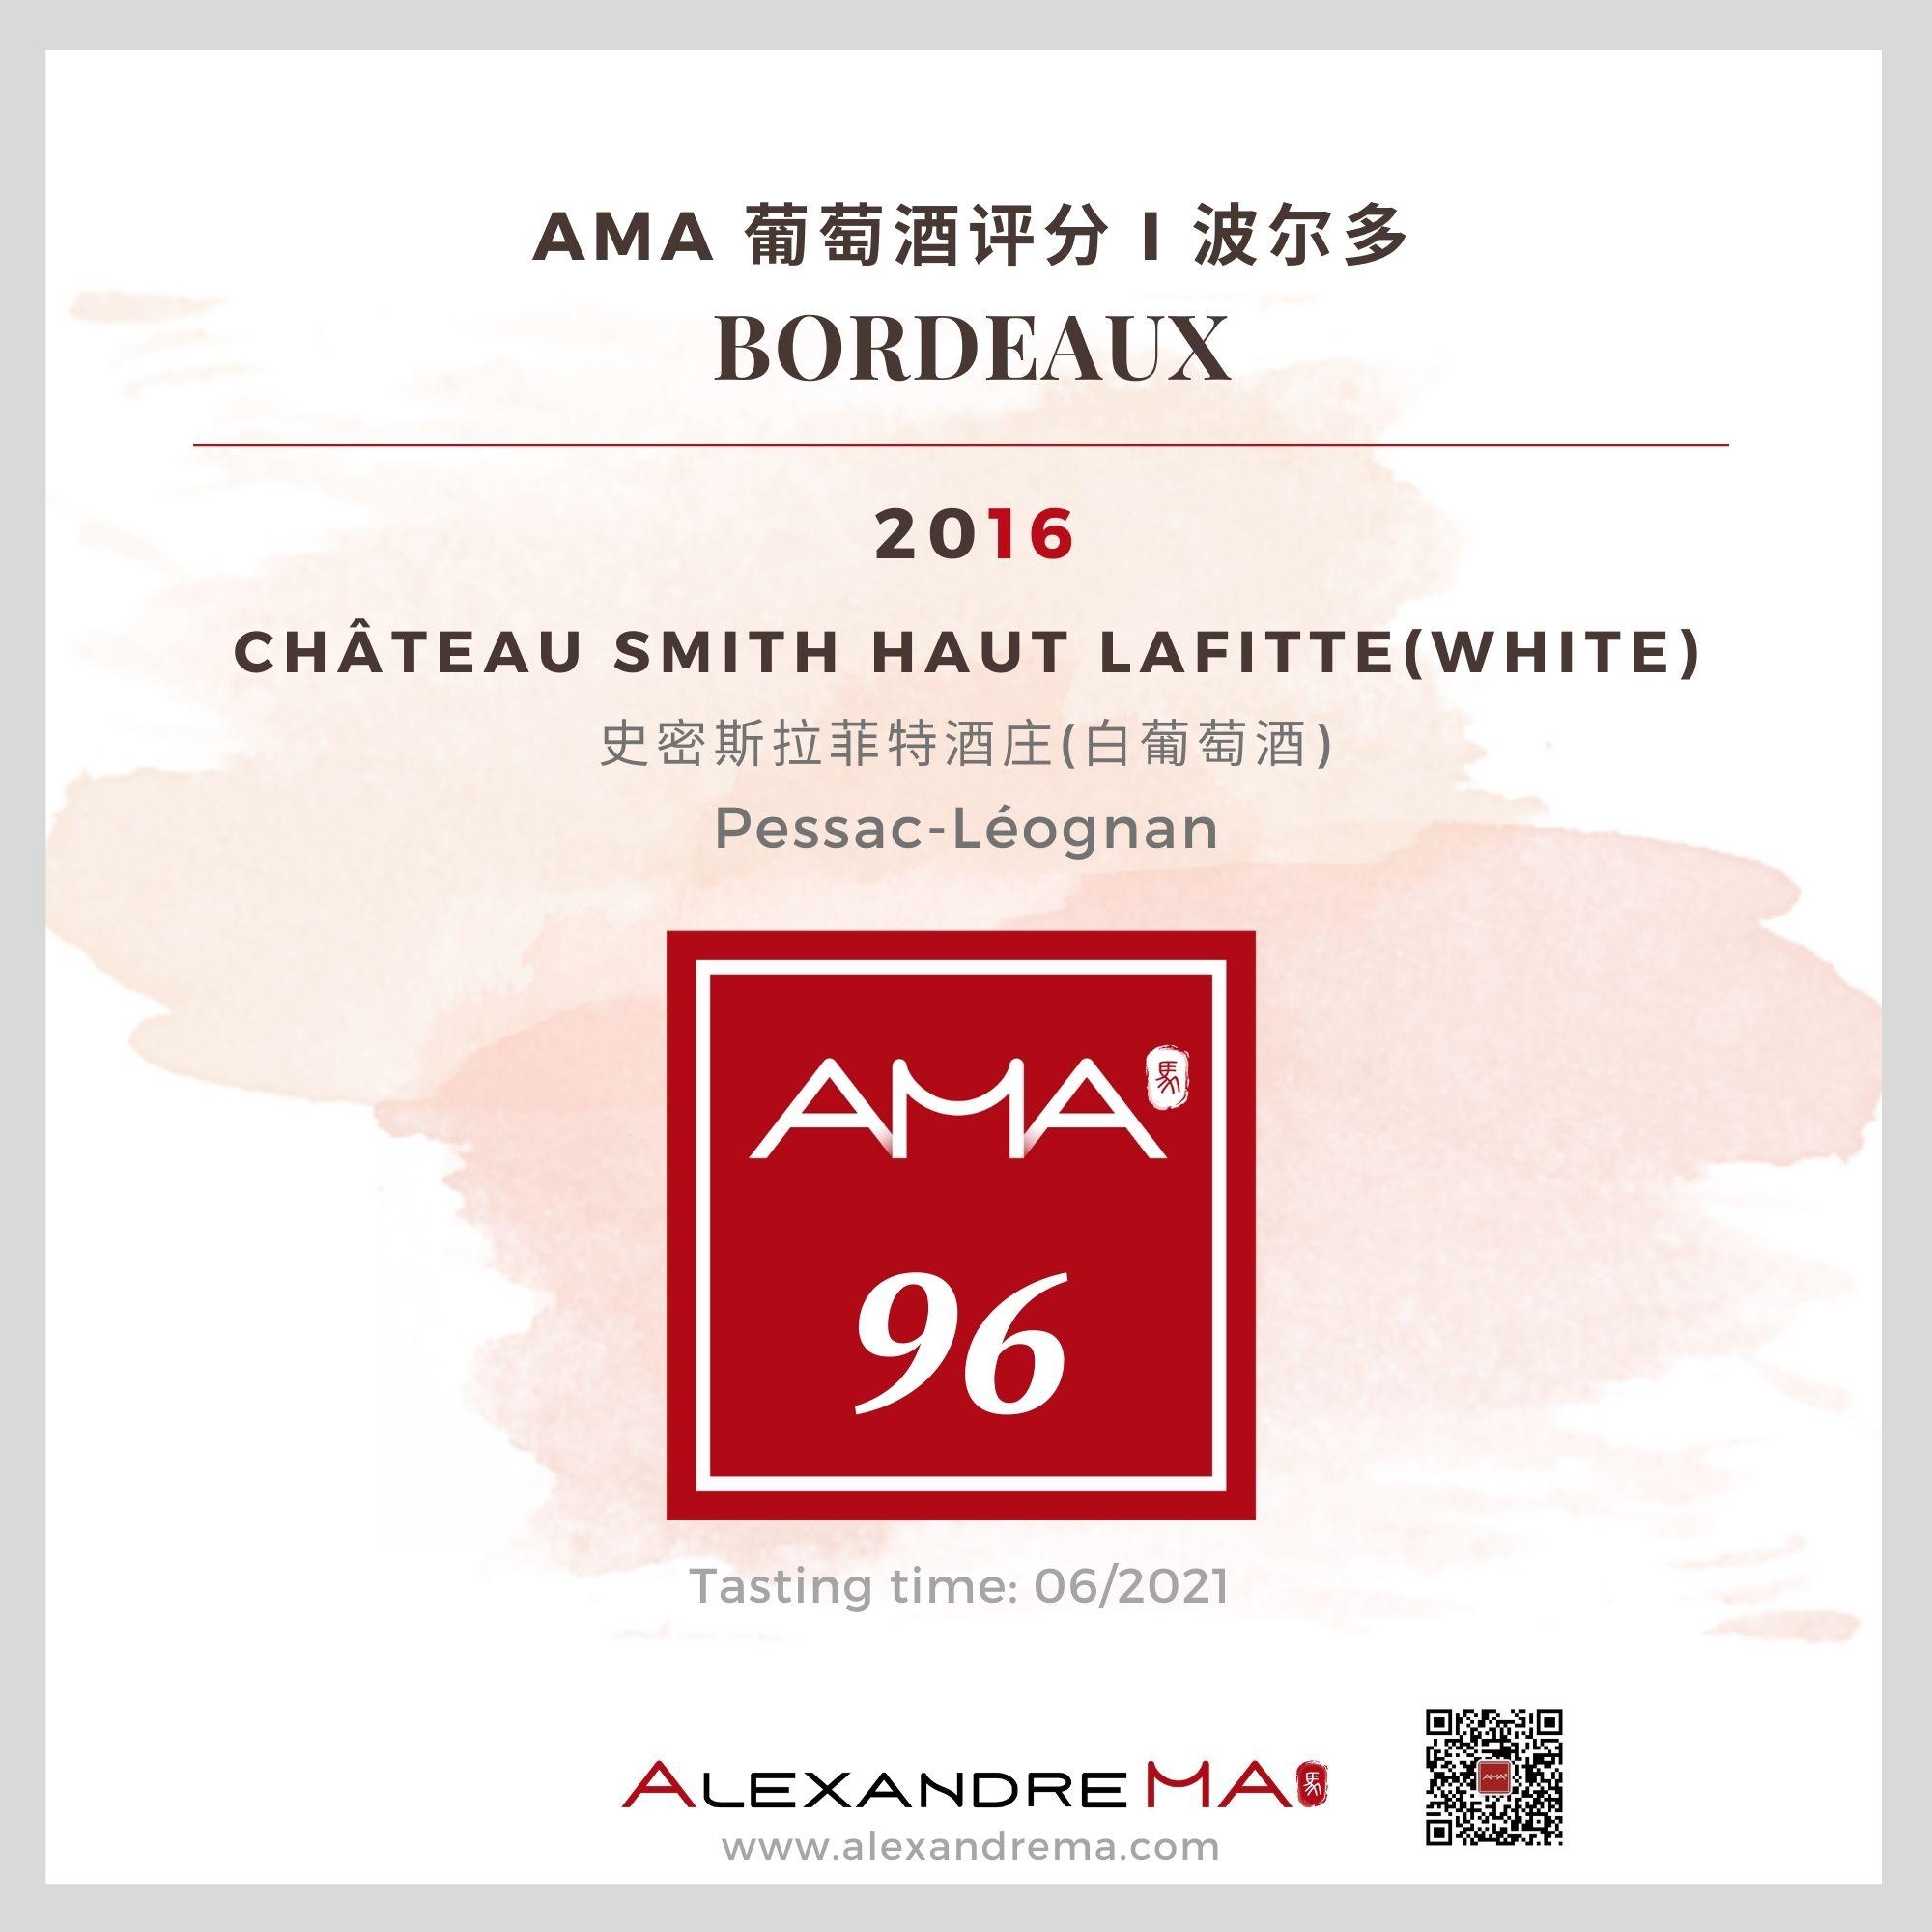 Château Smith Haut Lafitte White 2016 - Alexandre MA